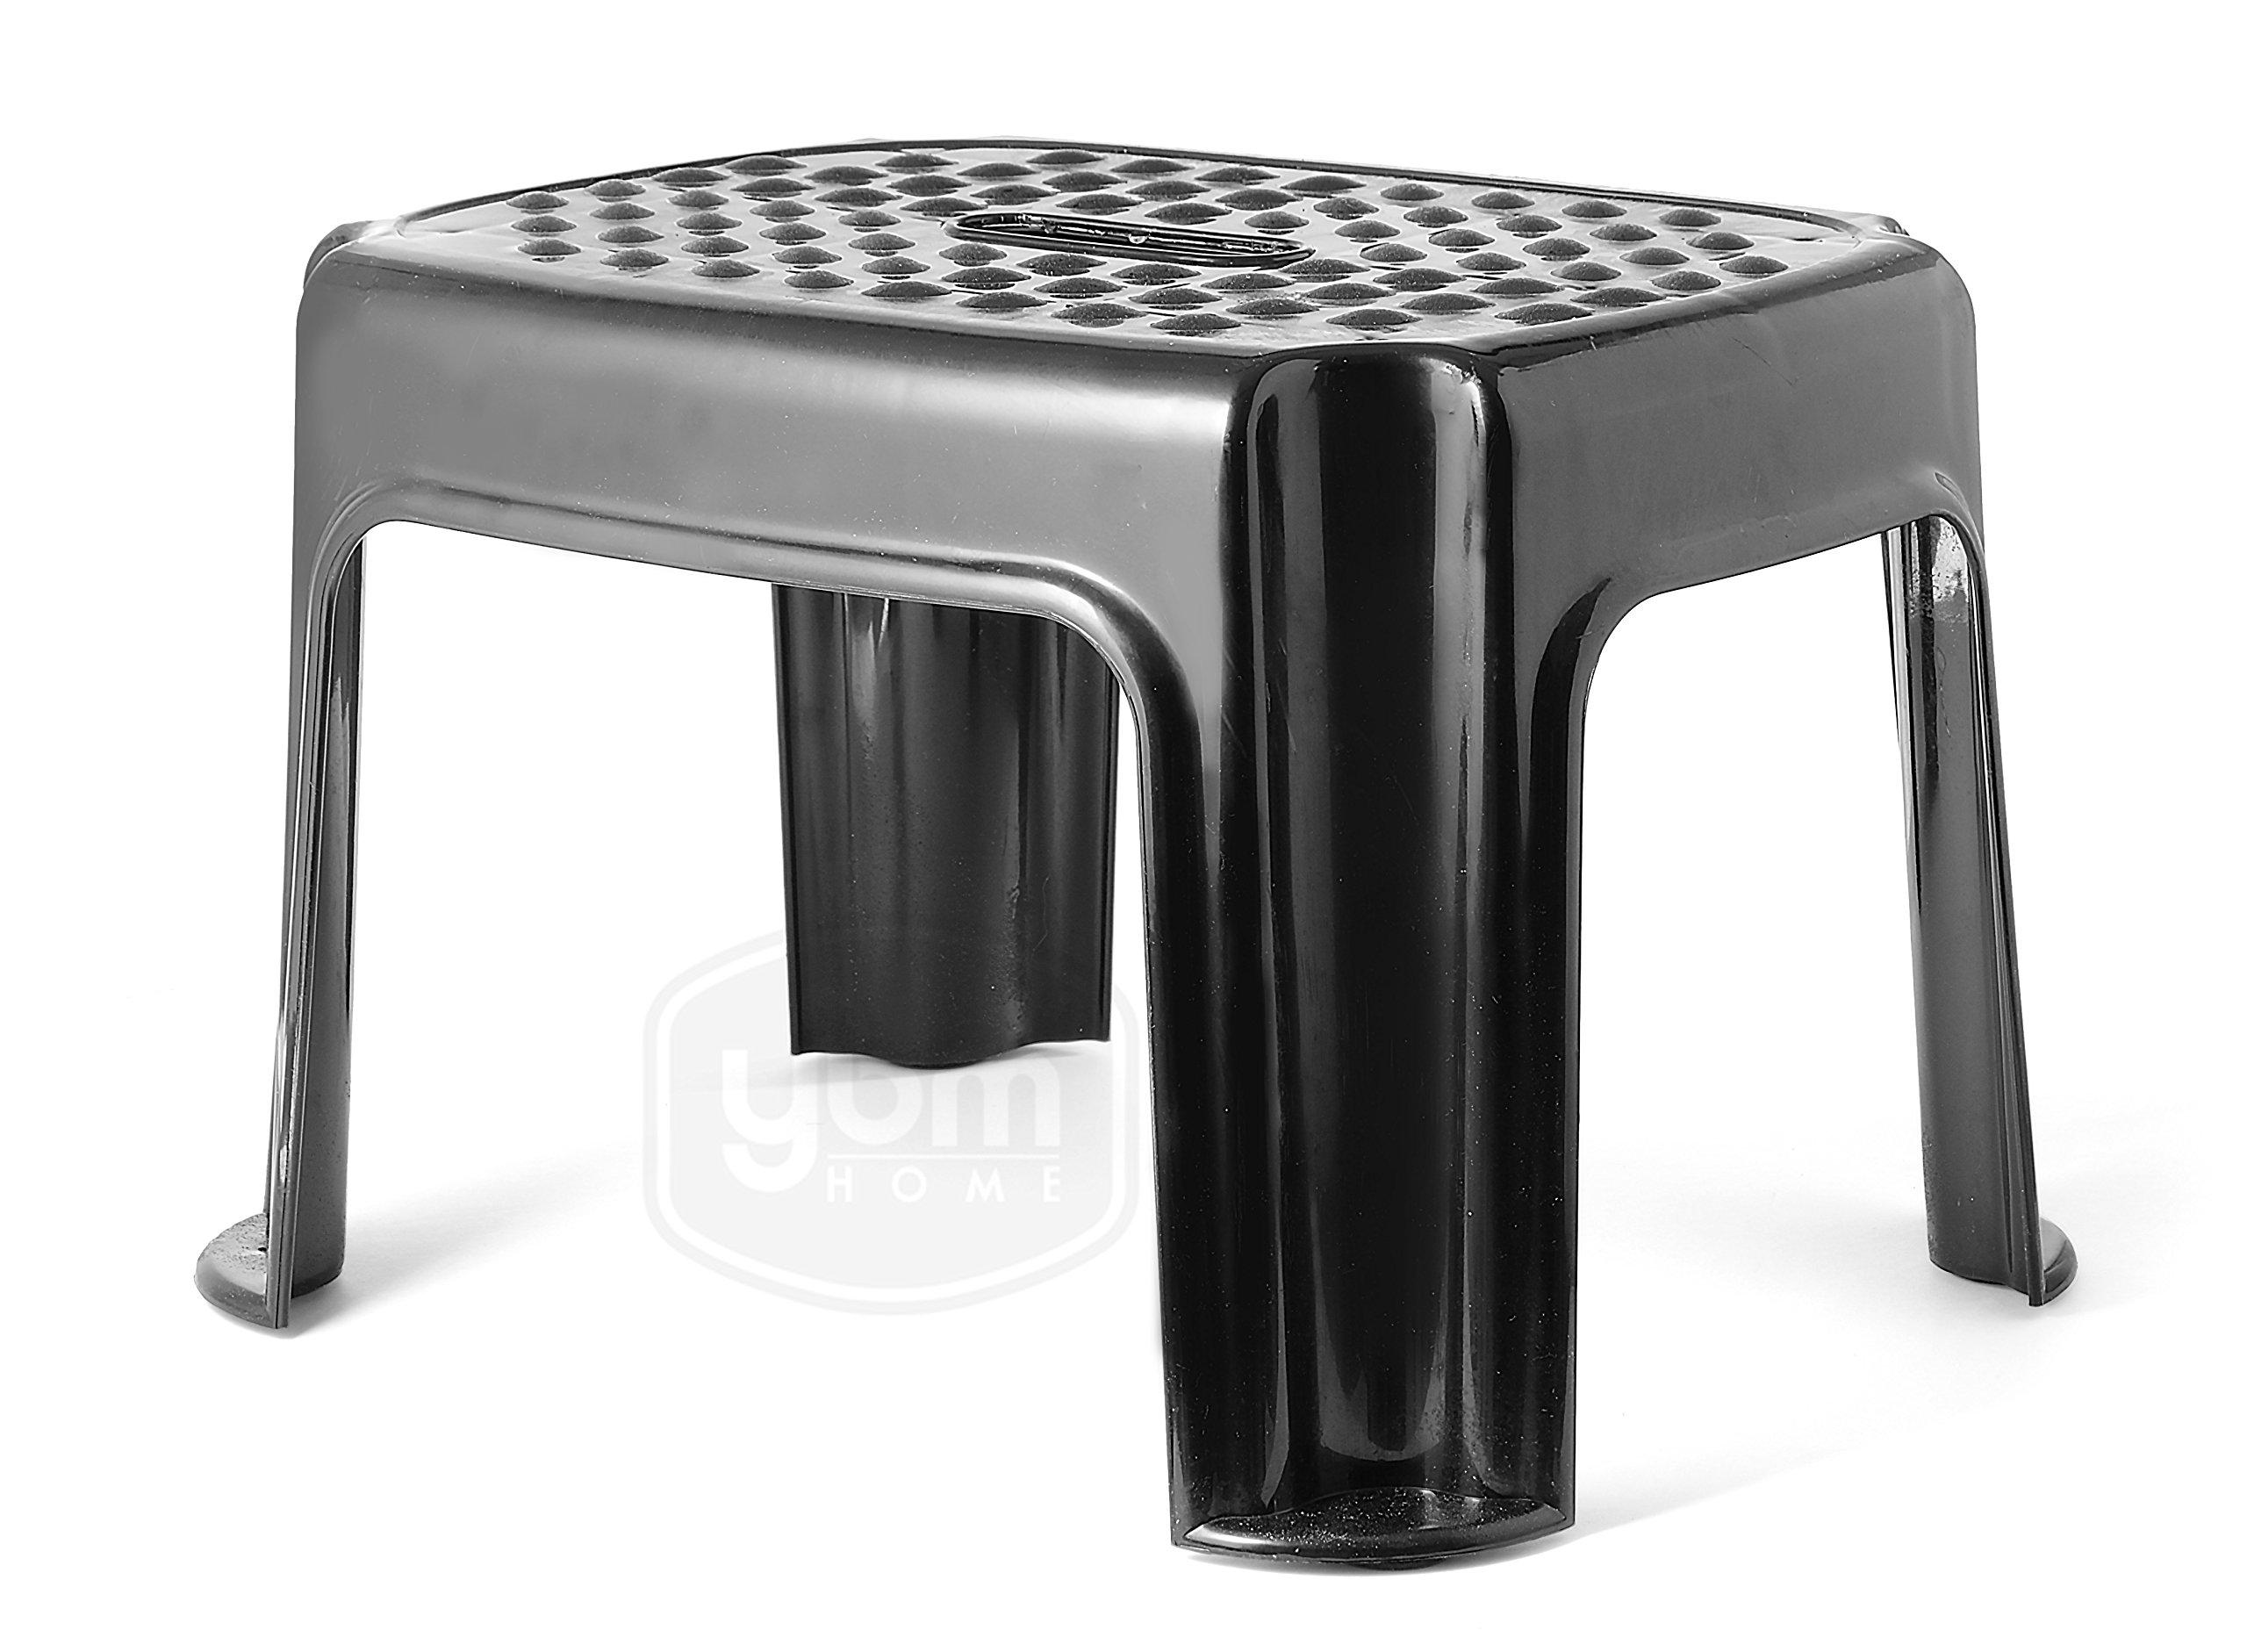 YBM Home Plastic Step Stool Great For Kitchen, Laundry Bath Office Garage 0305-bl black)